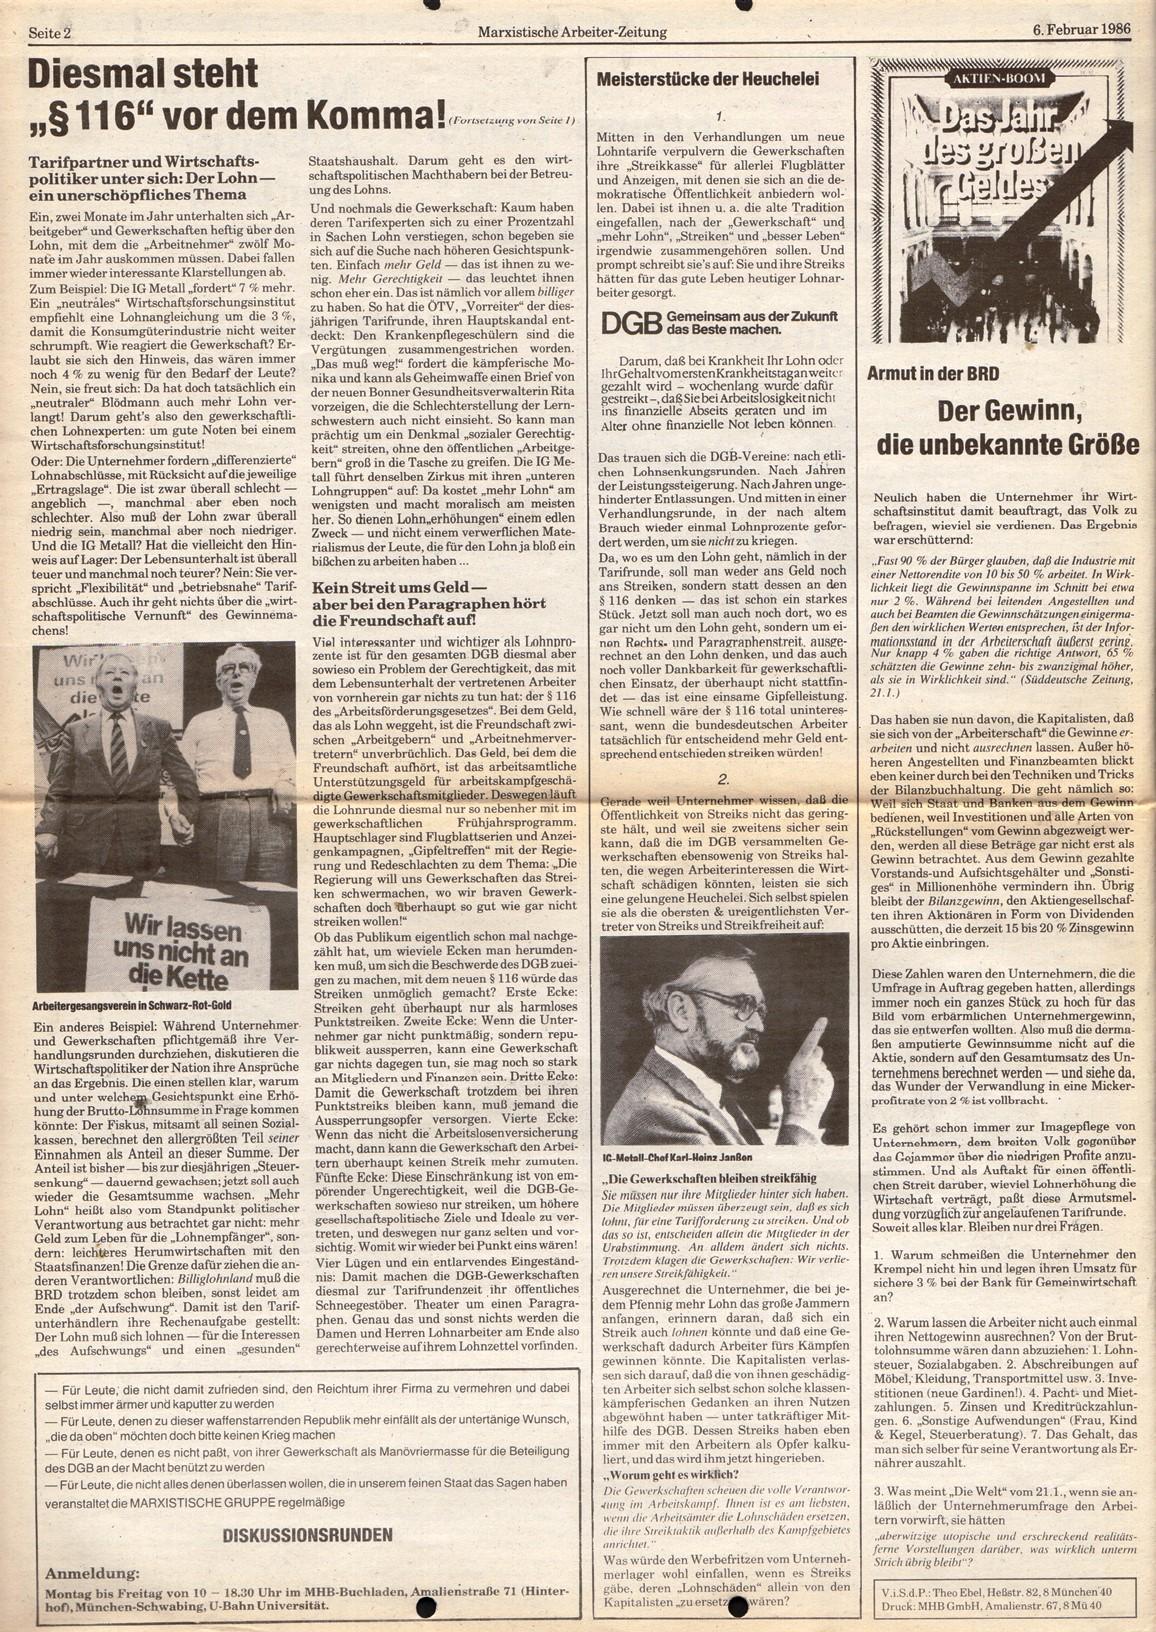 Muenchen_MG_MAZ_Krauss_Maffei_19860206_02